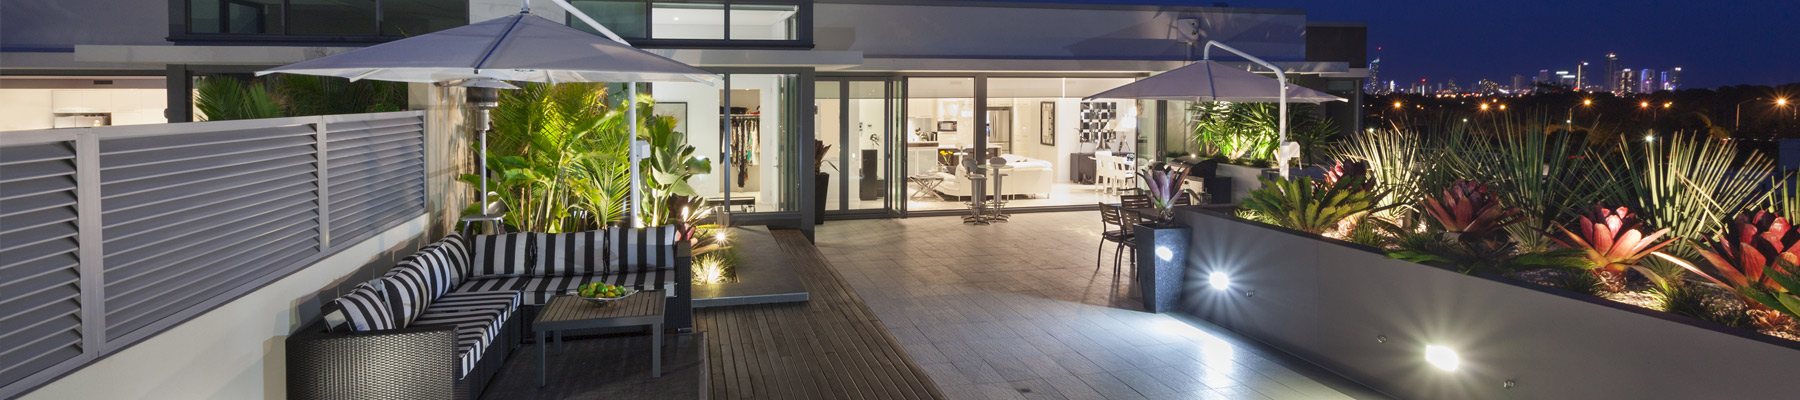 Enhanced outdoor spaces